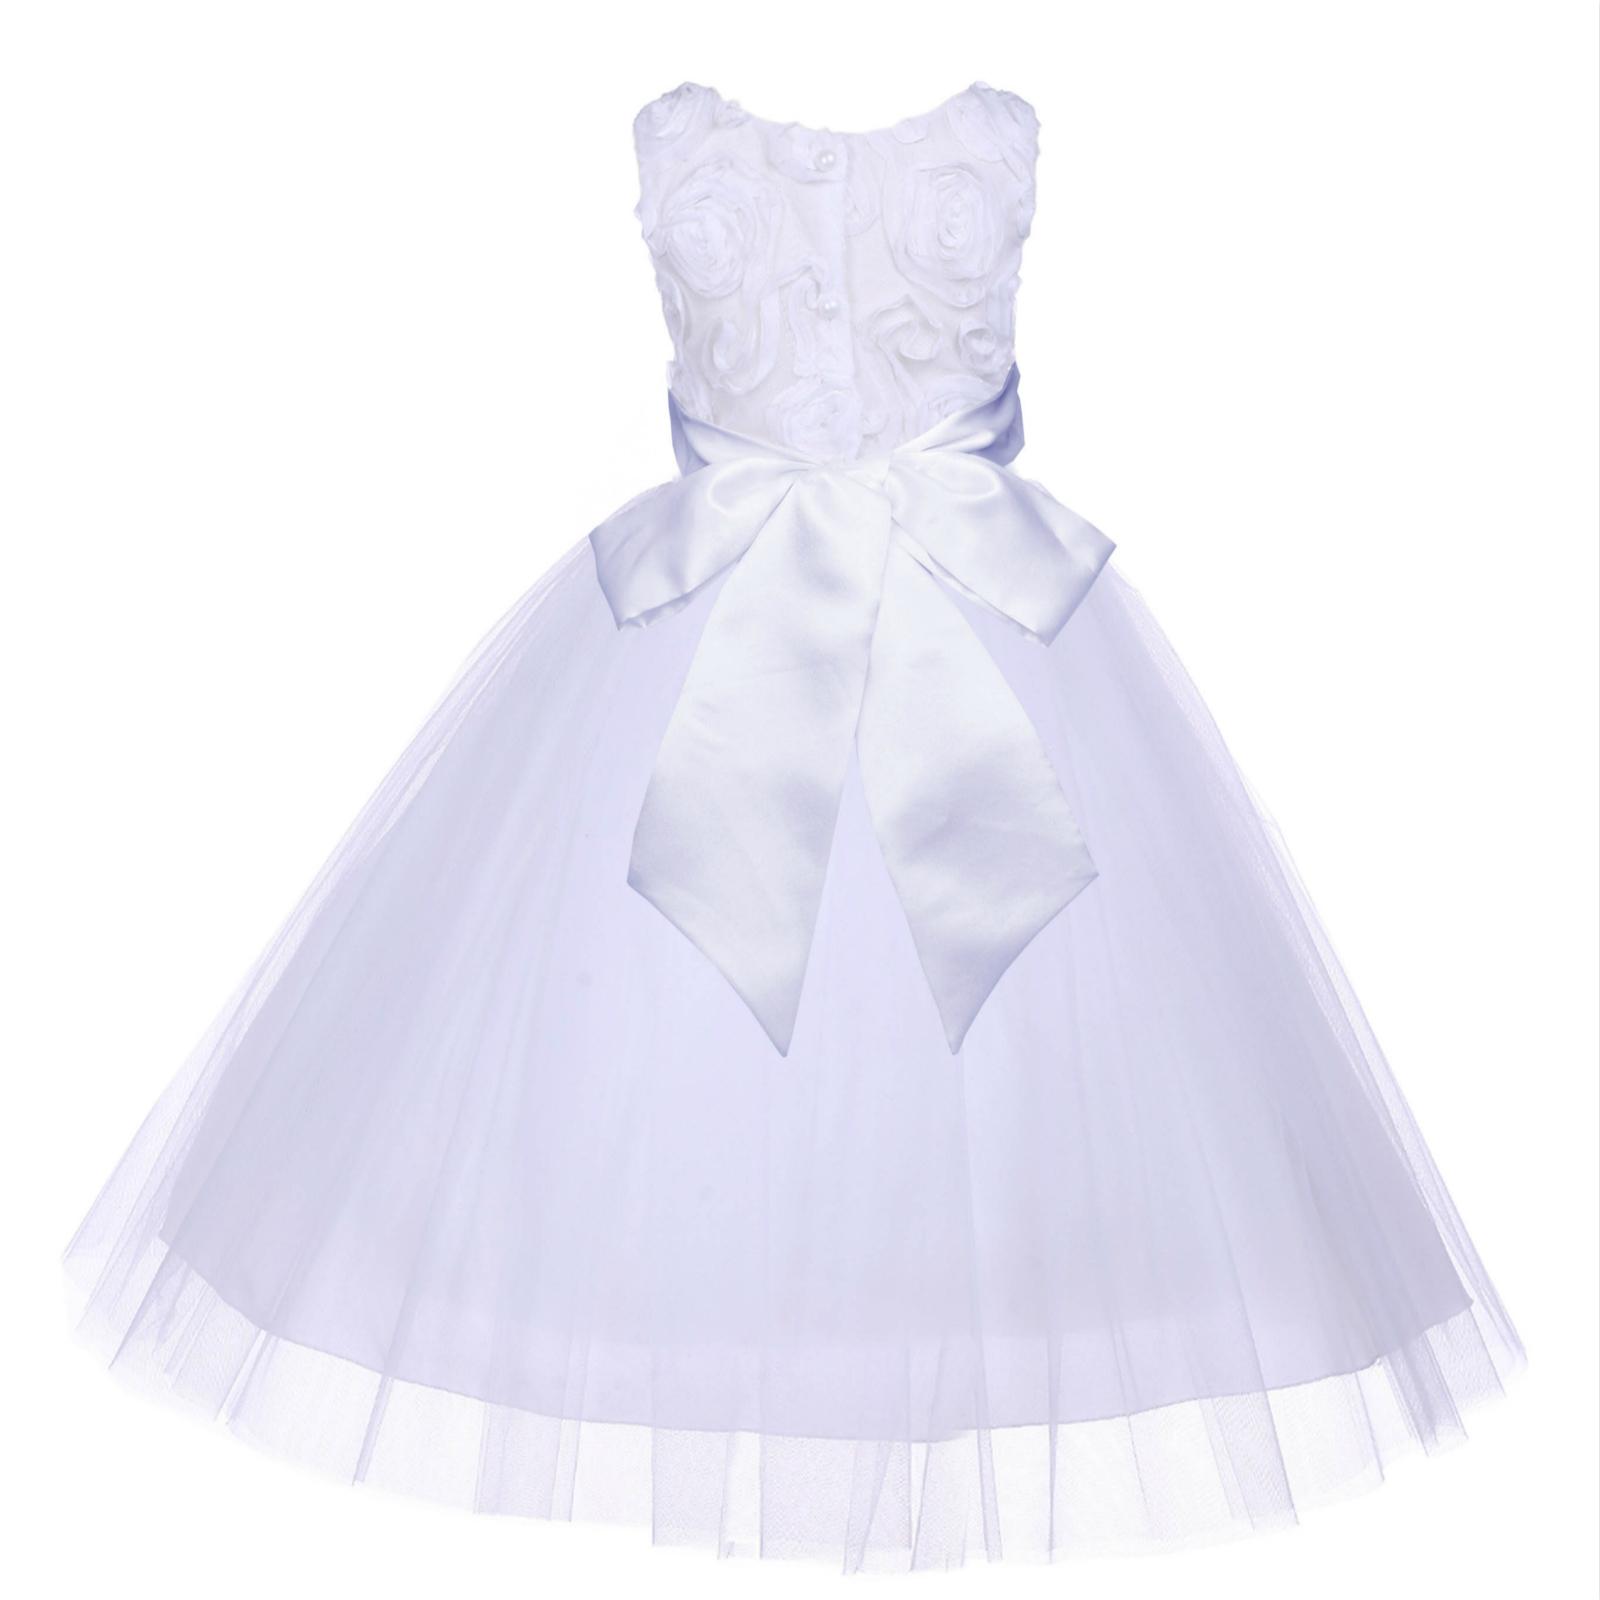 White Satin 3D Floral Design Flower Girl Dress Bridesmaid Pageant 152s